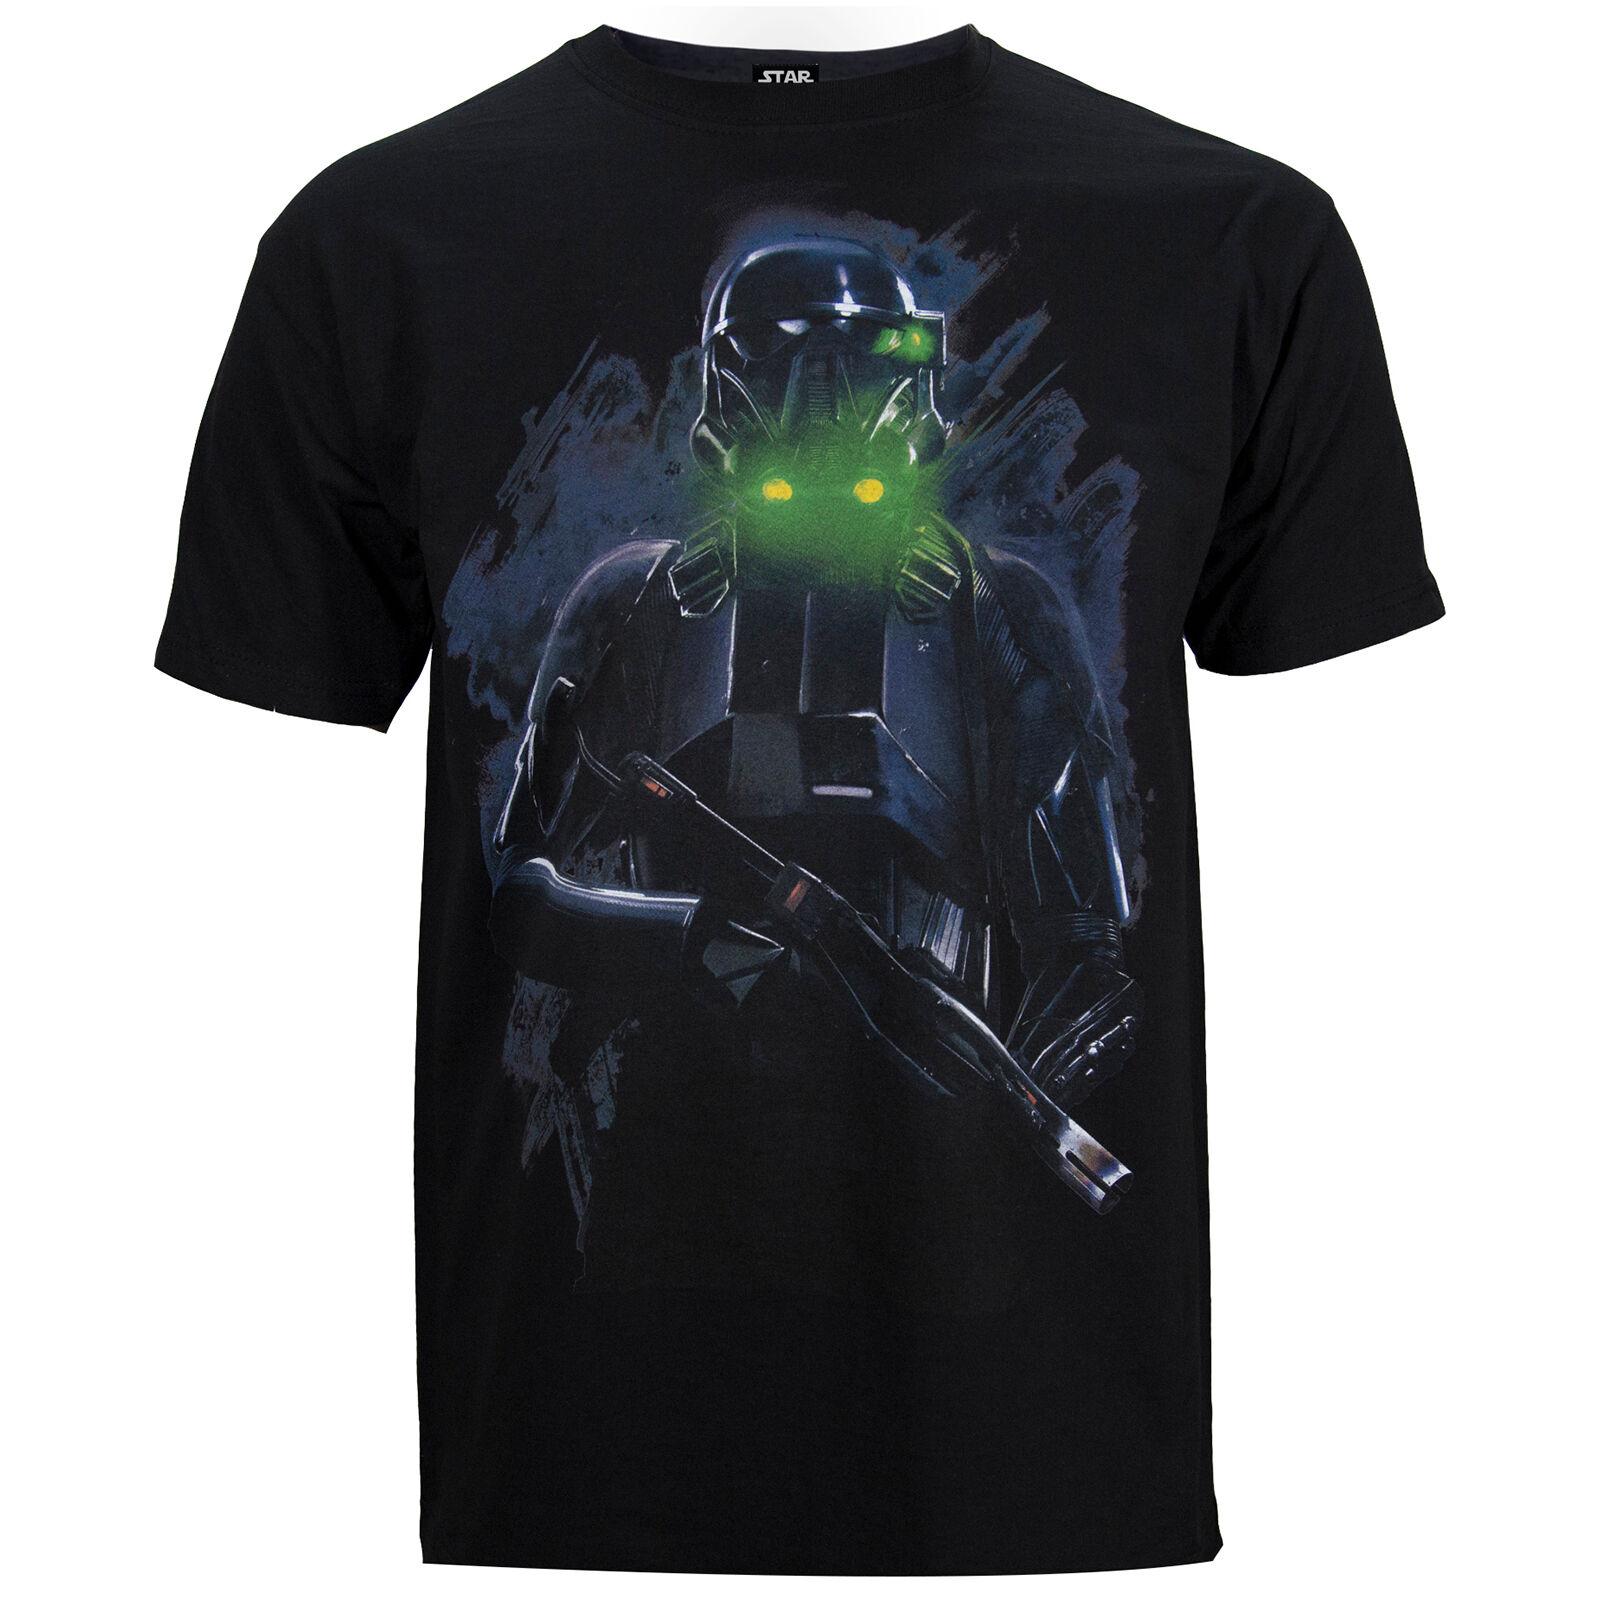 Geek Clothing Star Wars Rogue One Men's Death Trooper T-Shirt - Black - XL - Black